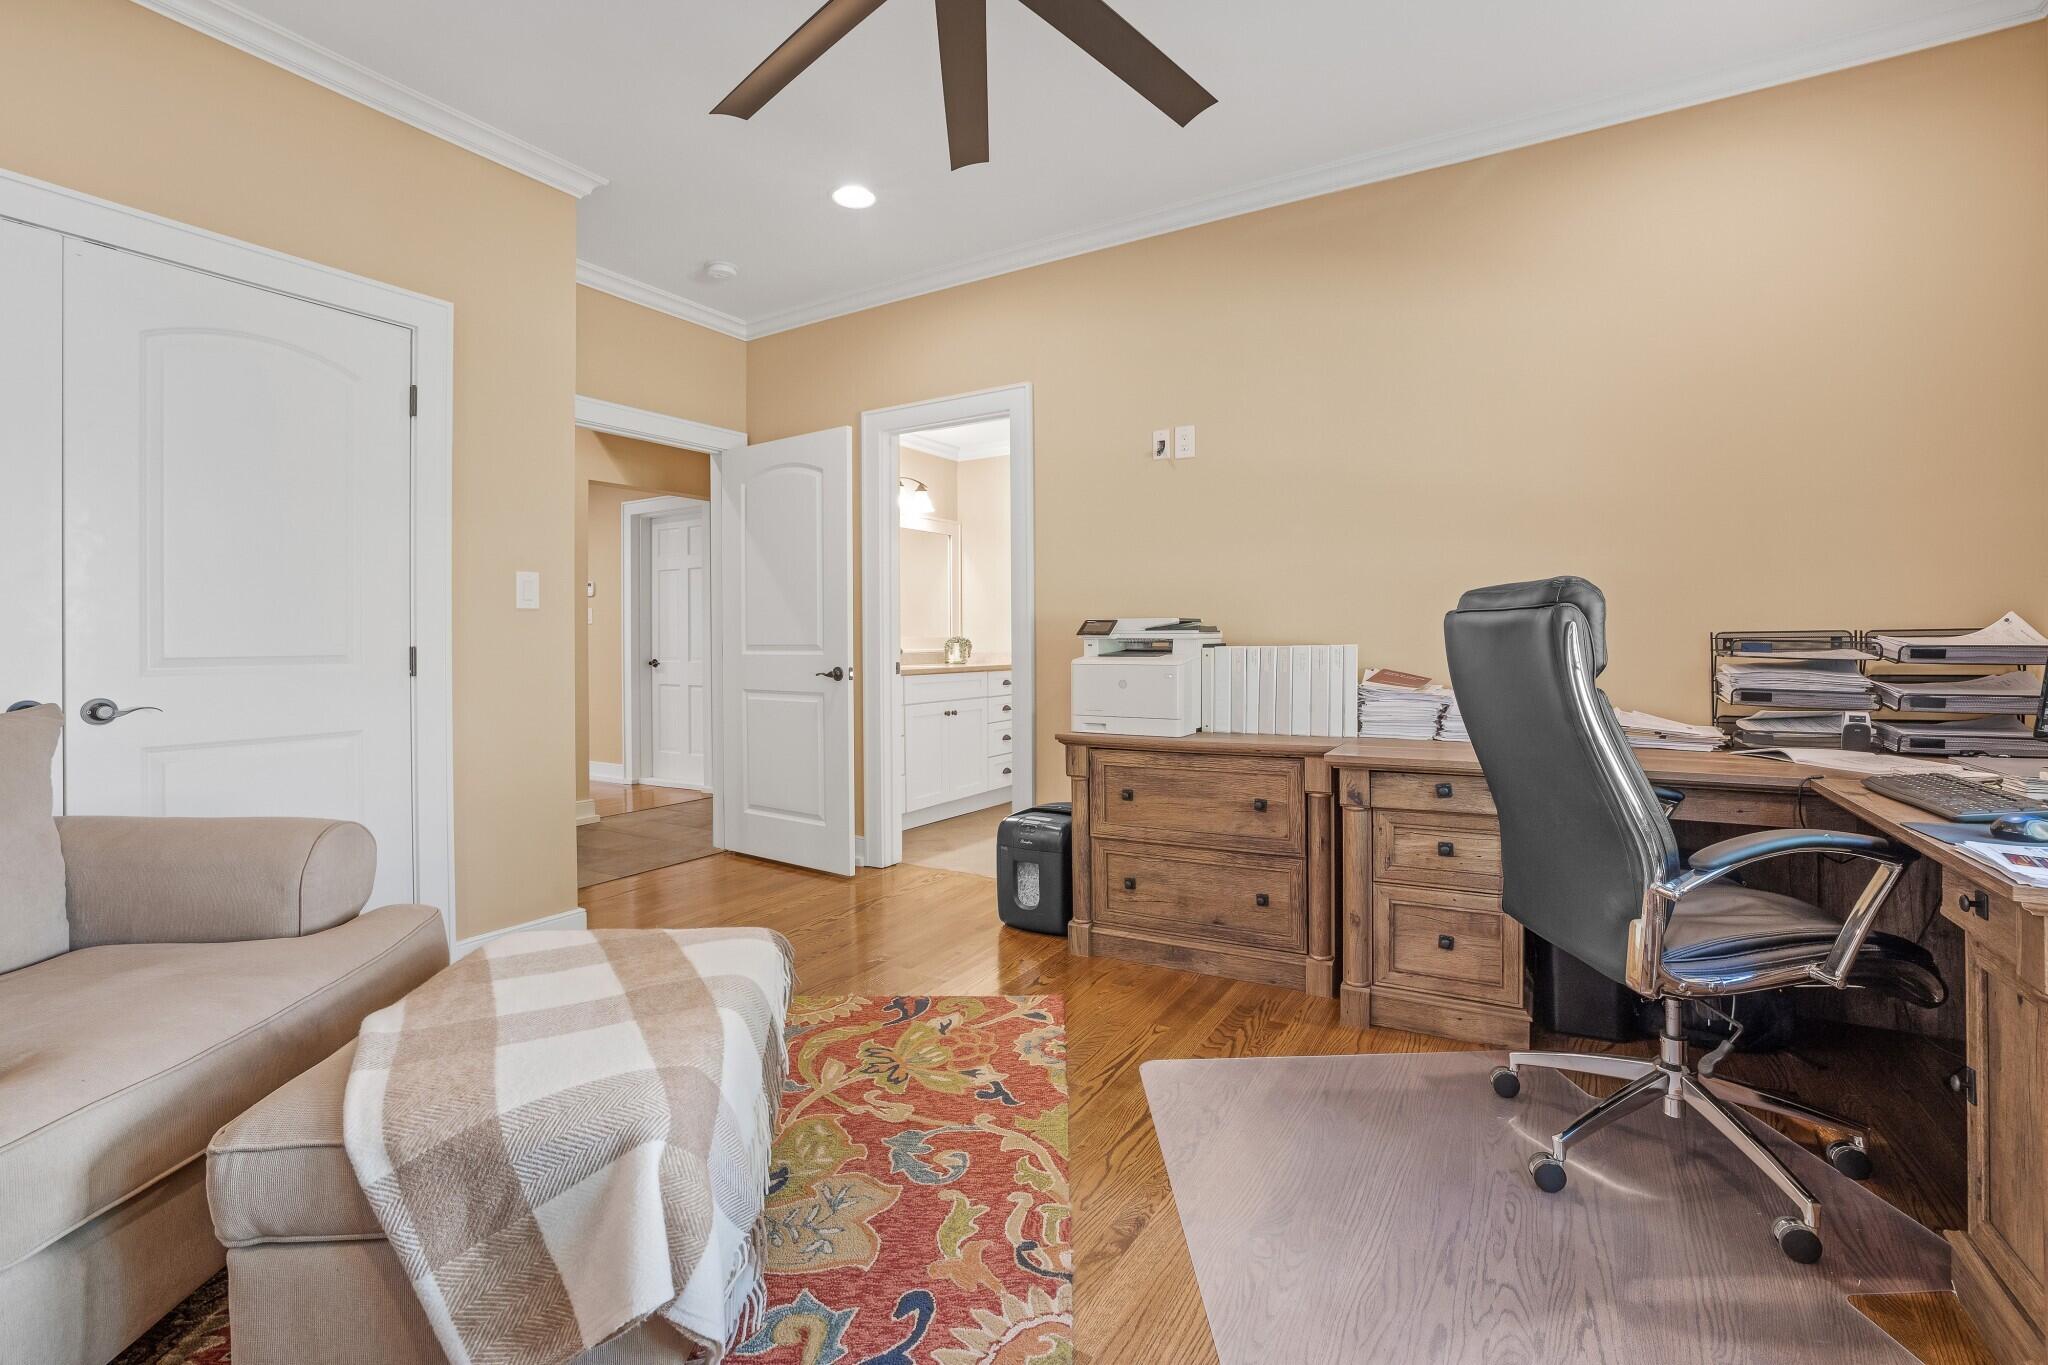 Bedroom 3 or Office